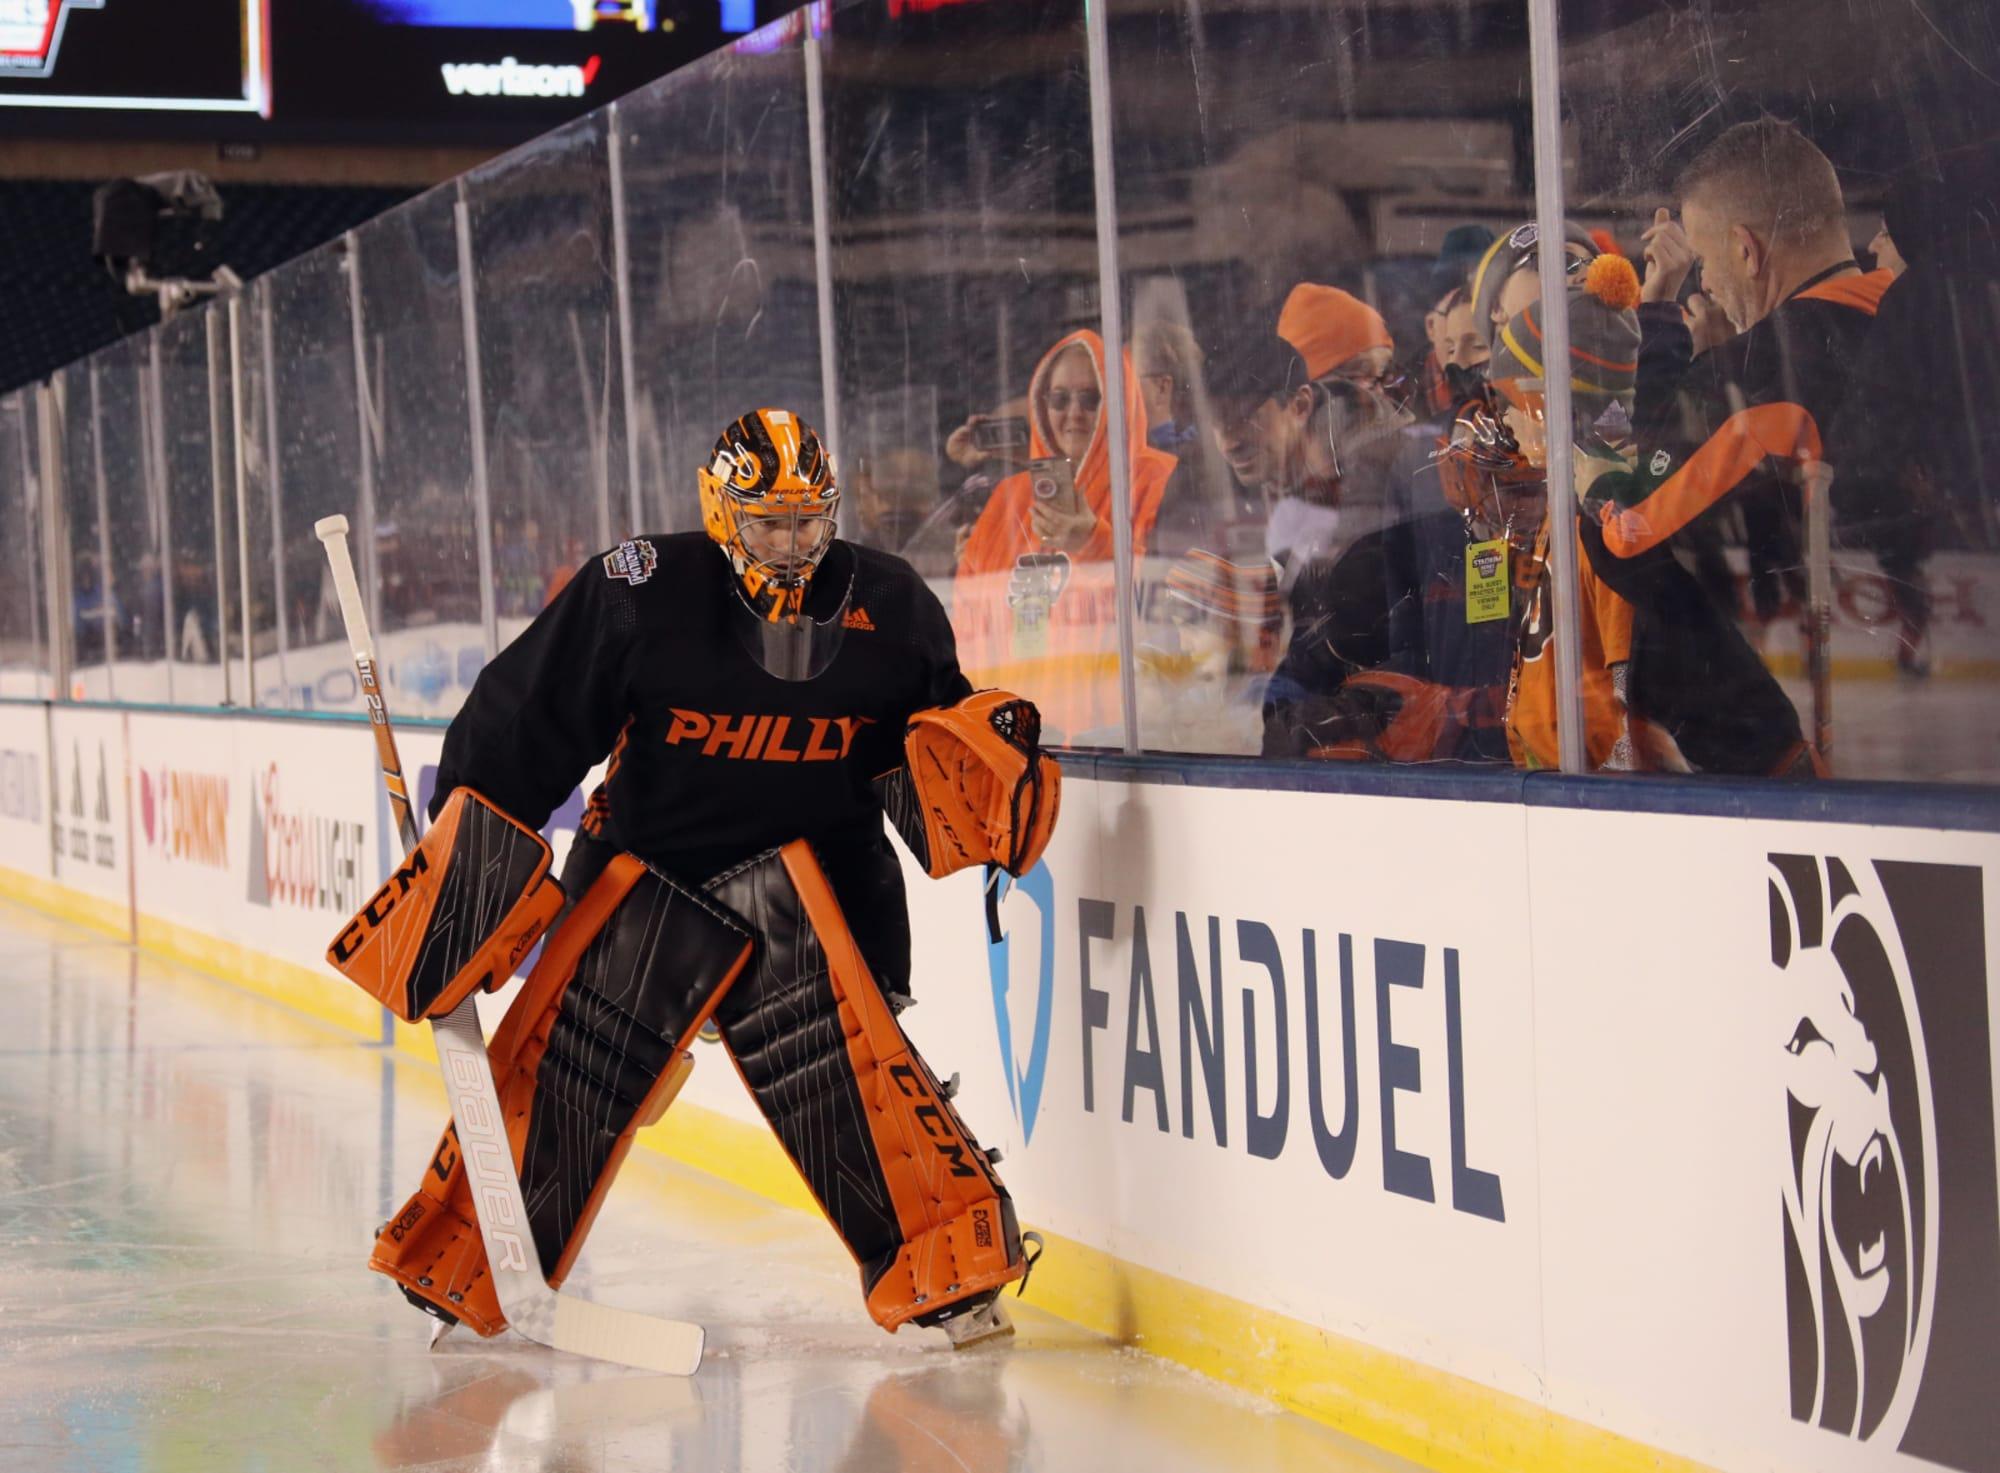 Grading Philadelphia Flyers Jersey Concepts